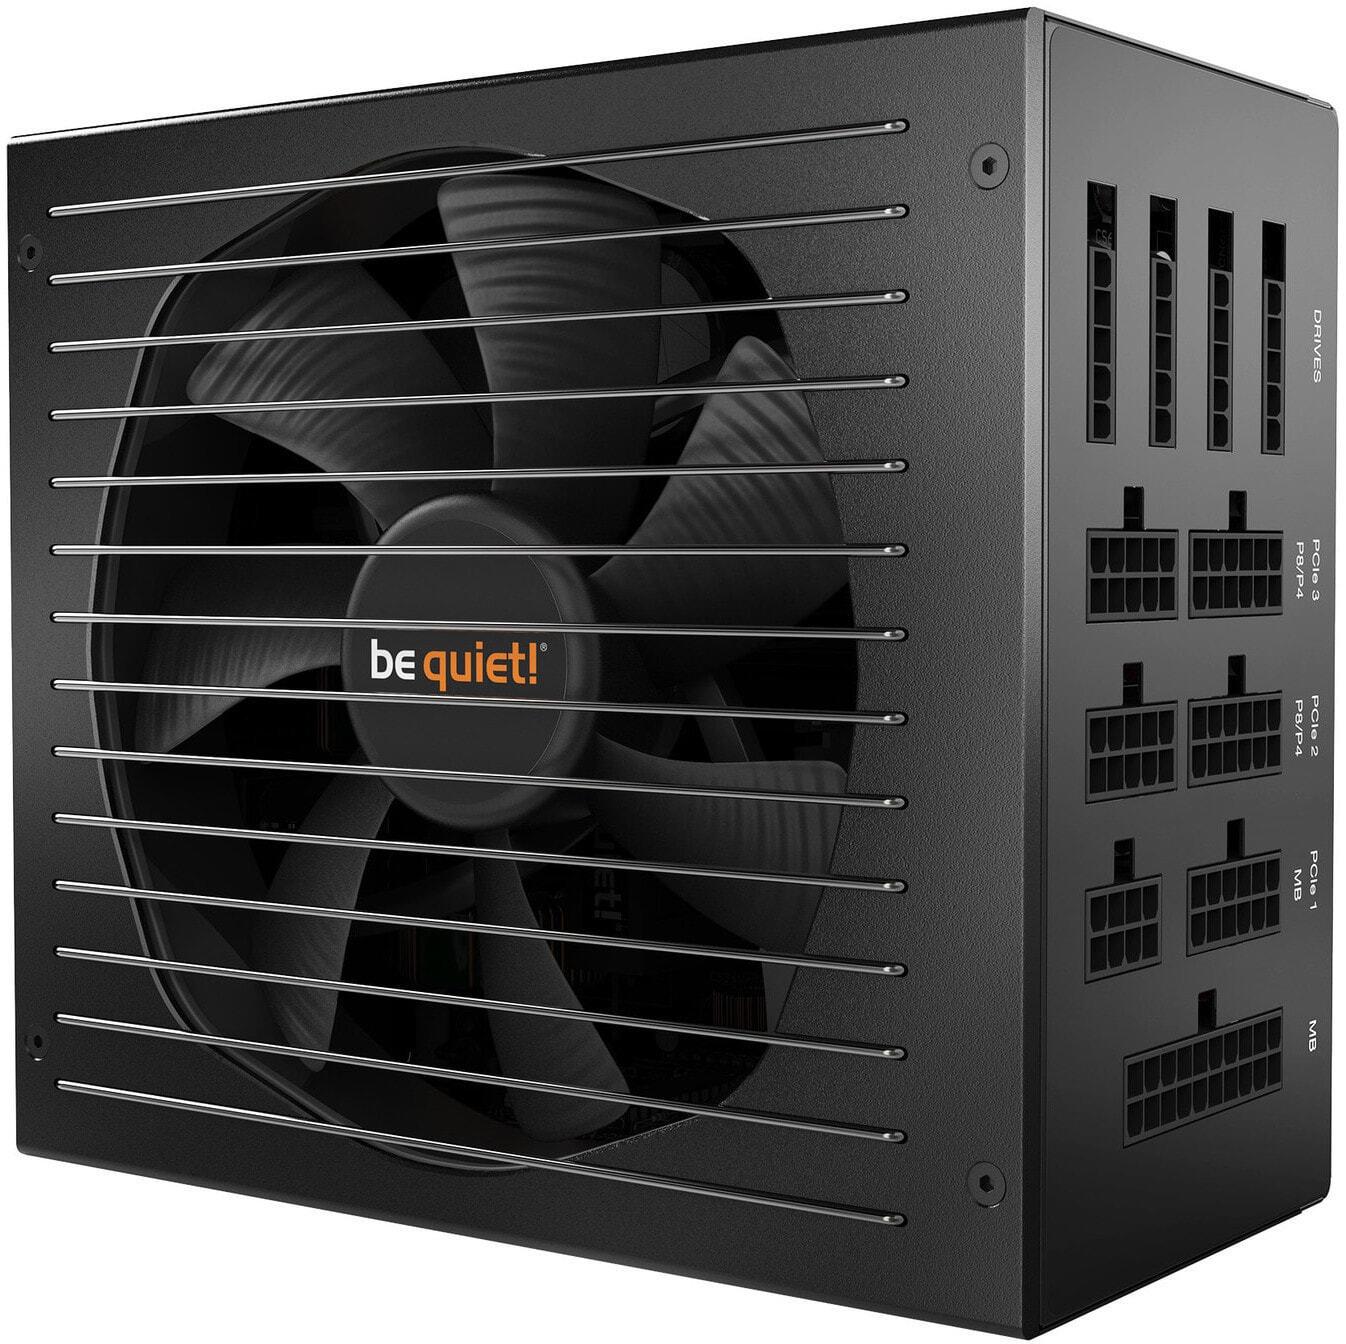 be quiet! Straight Power 11 блок питания 1000 W 20+4 pin ATX ATX Черный BN285